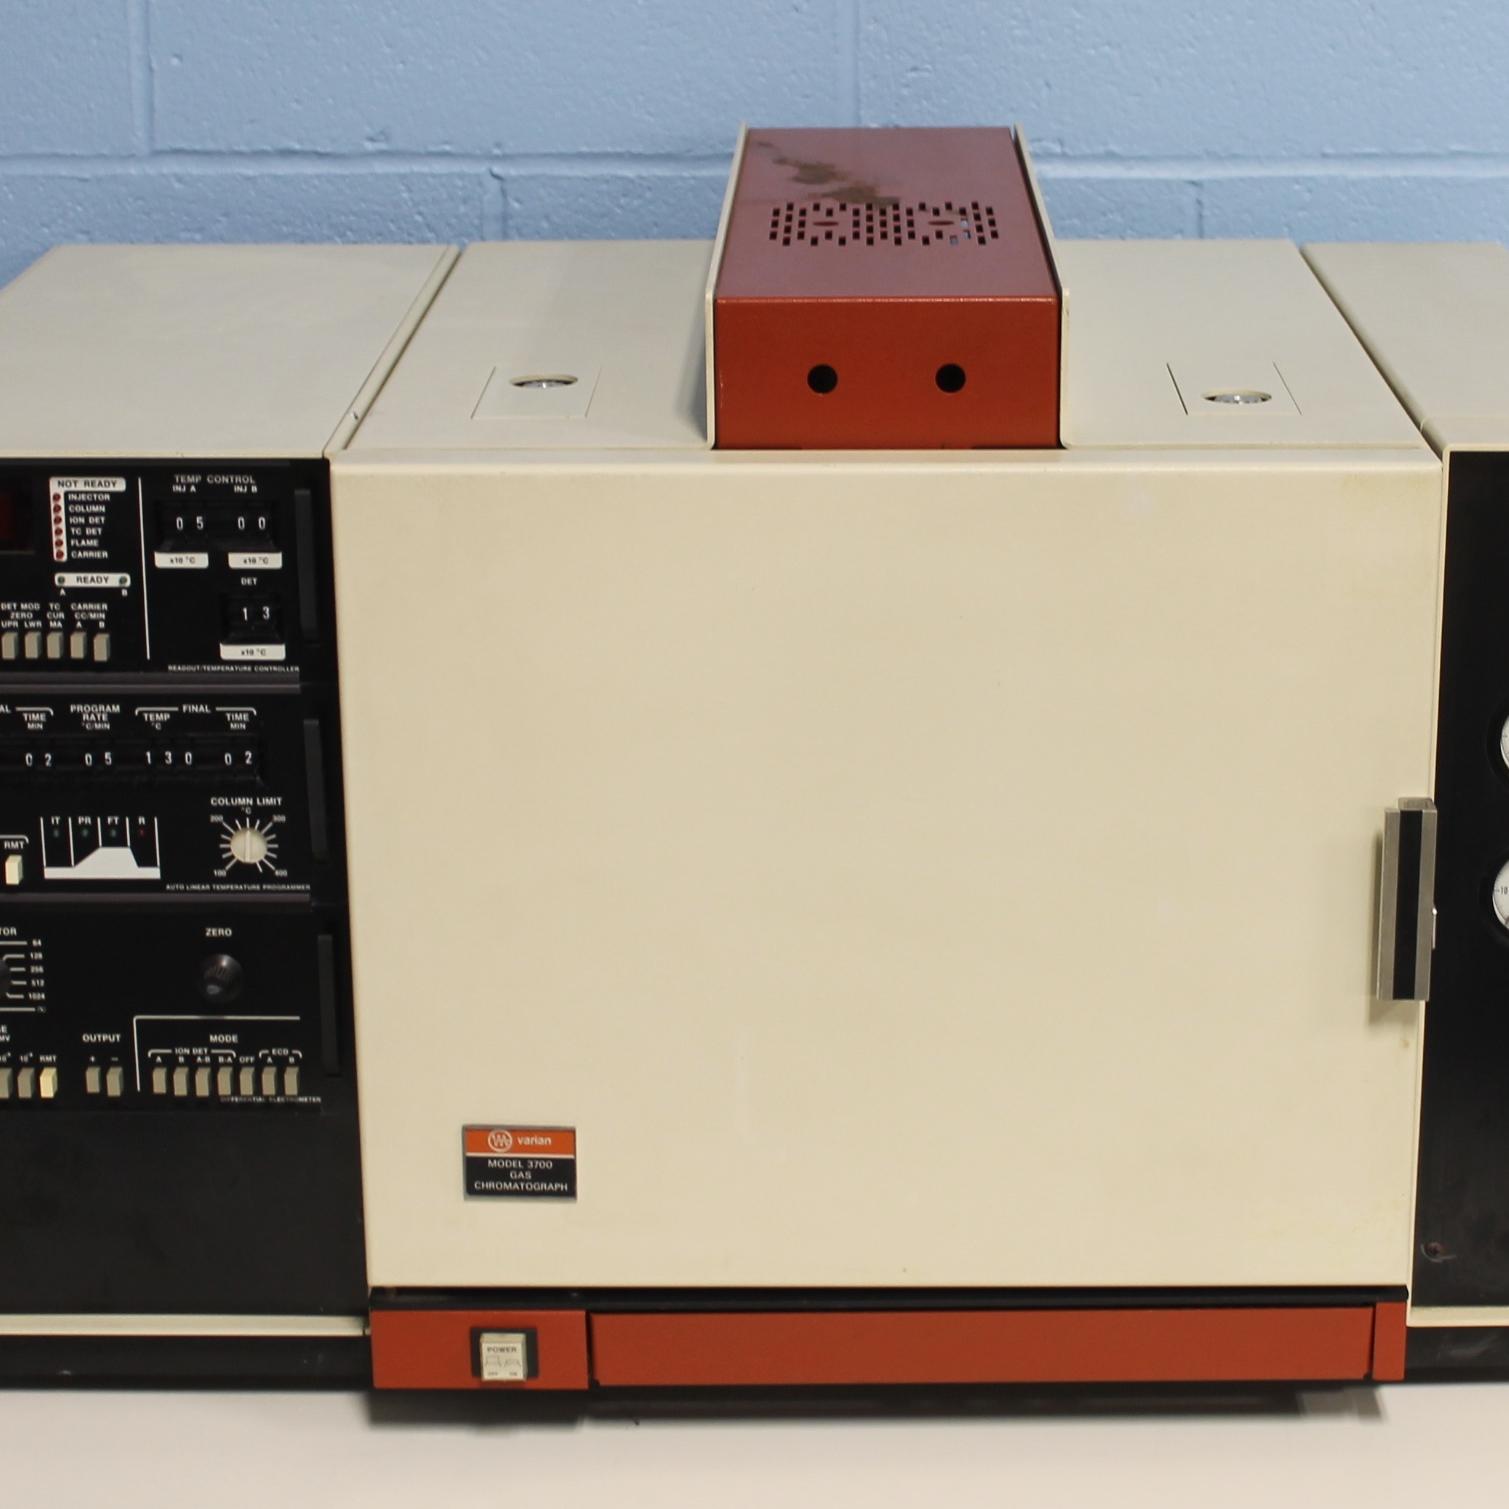 Varian 3700 Gas Chromatograph Image